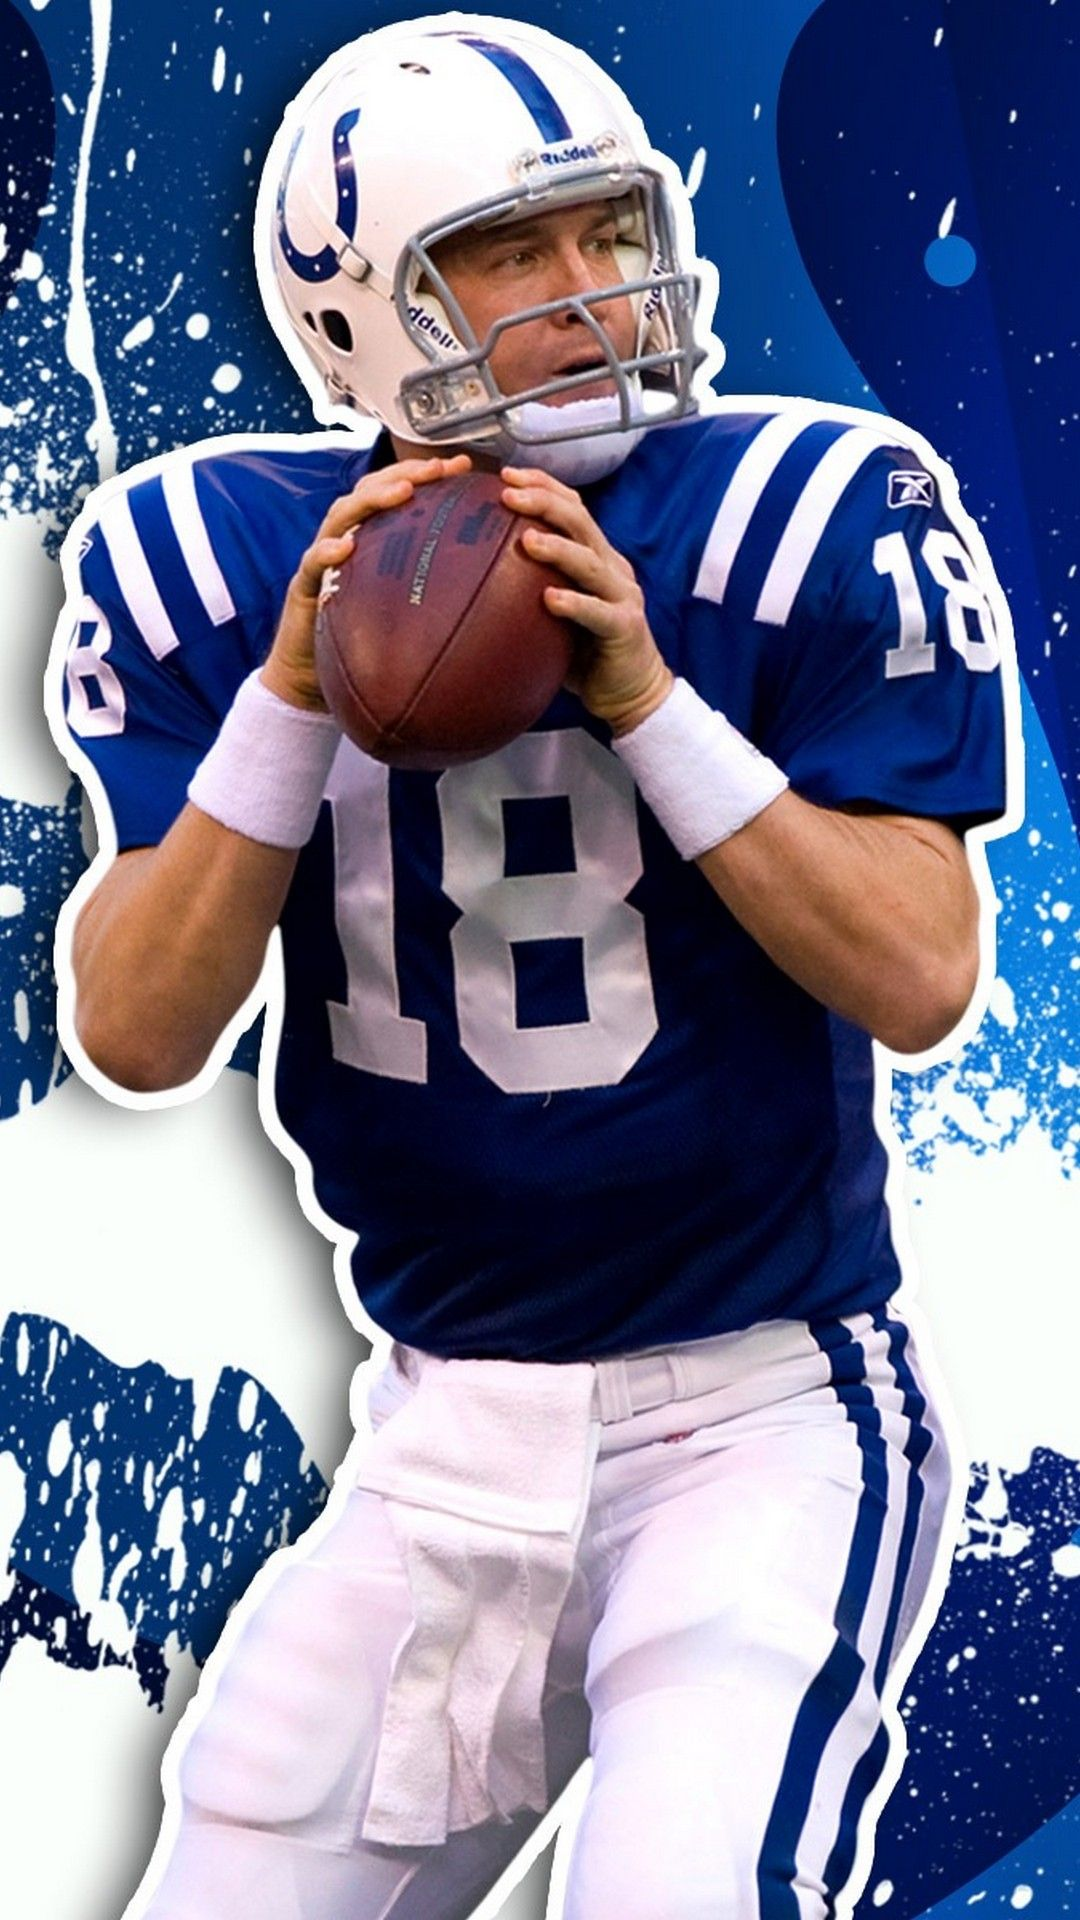 iPhone Wallpaper HD Peyton Manning Indianapolis Colts